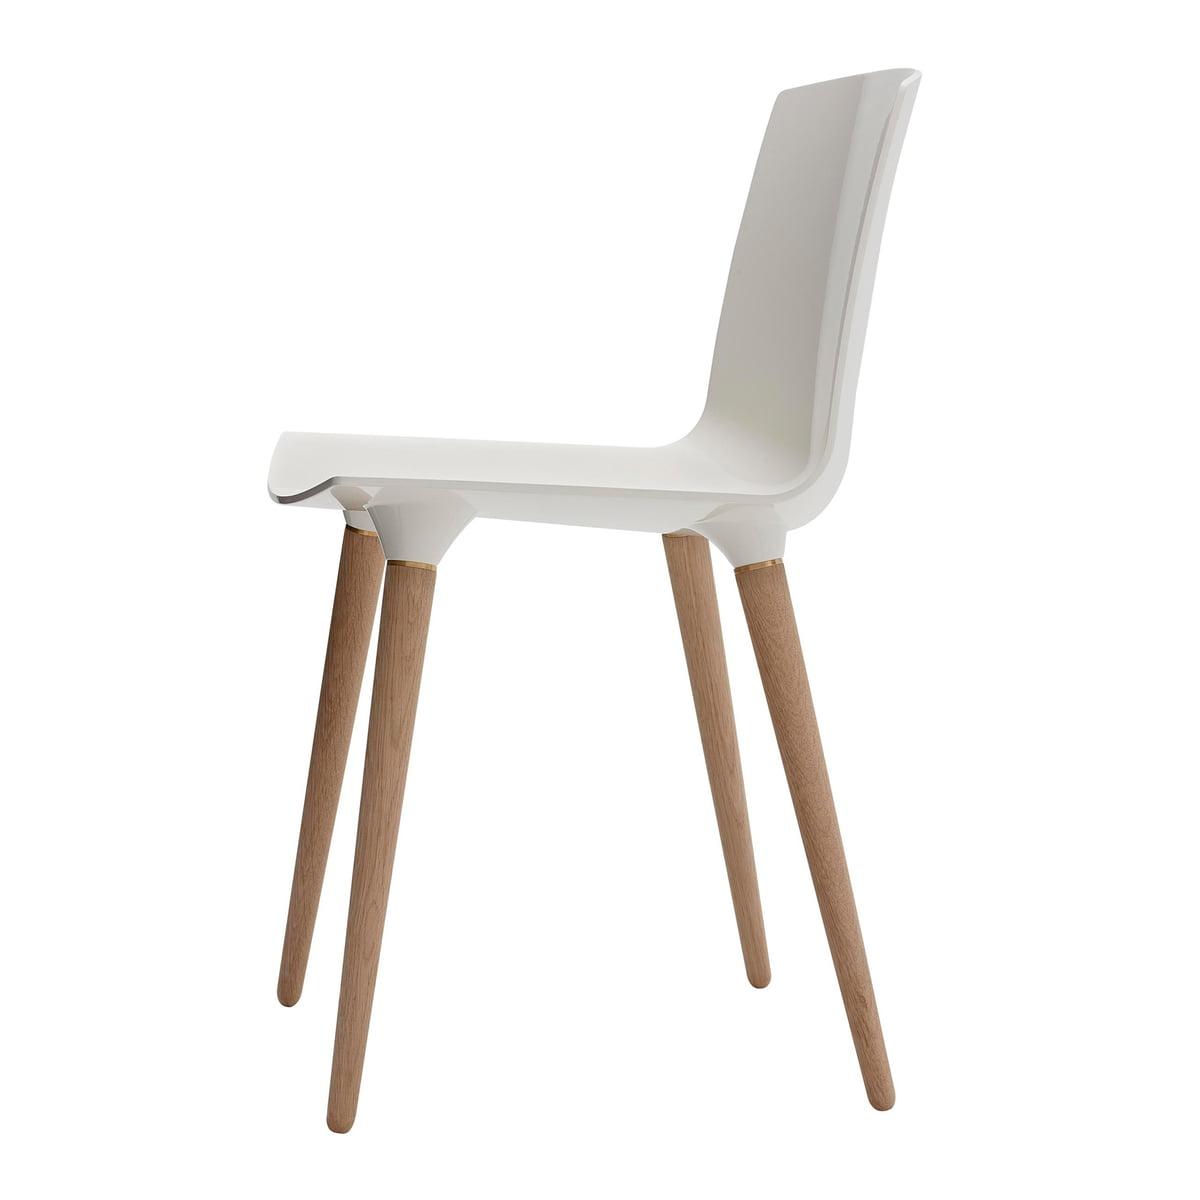 stuhl eiche wei finest normann copenhagen stuhl form design simon legald weiss eiche with stuhl. Black Bedroom Furniture Sets. Home Design Ideas